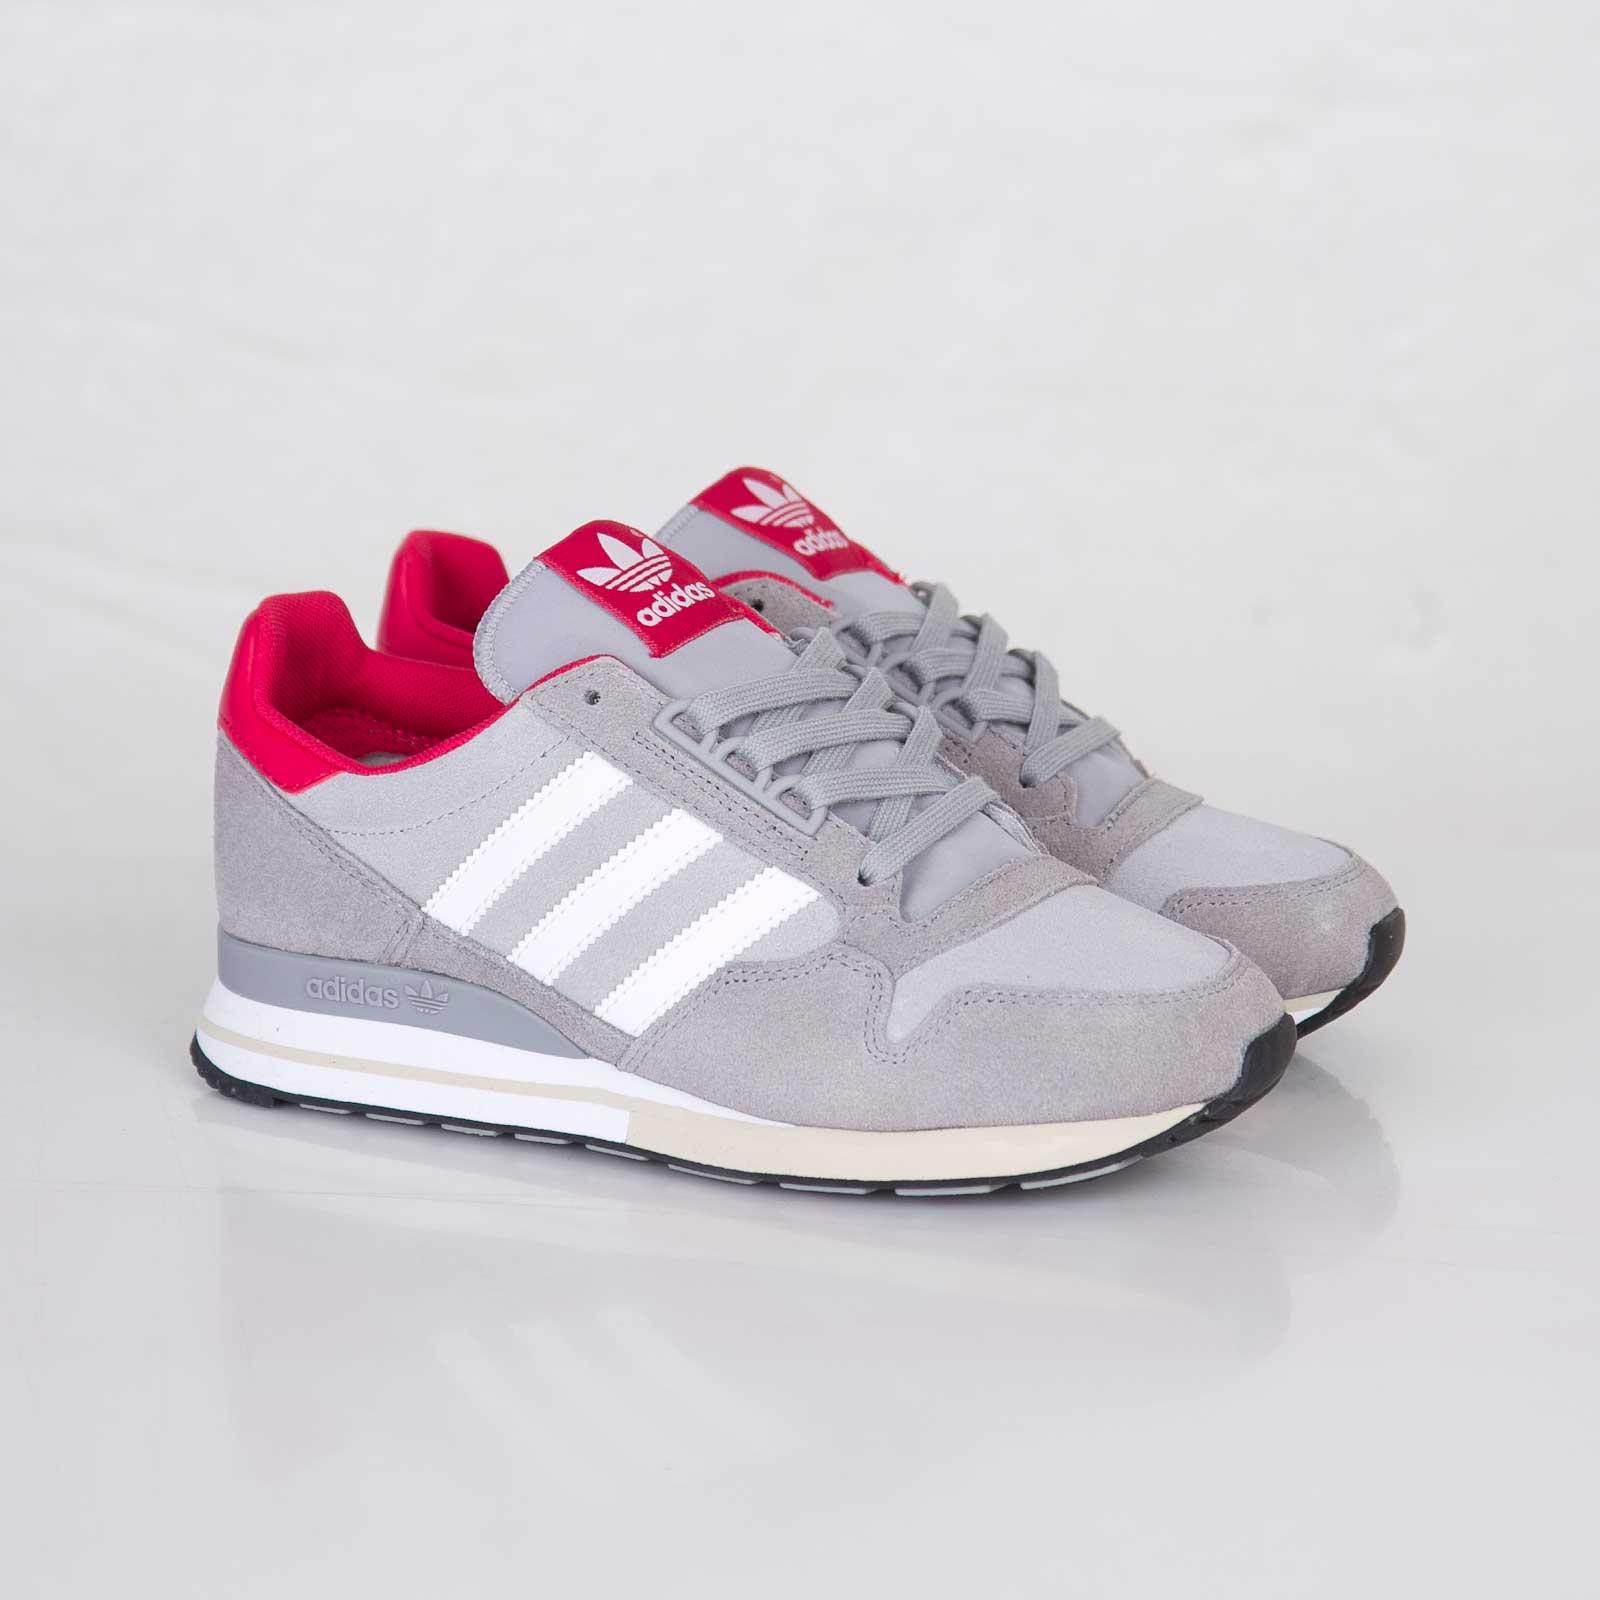 adidas ZX 500 OG W D65398 Sneakersnstuff | sneakers